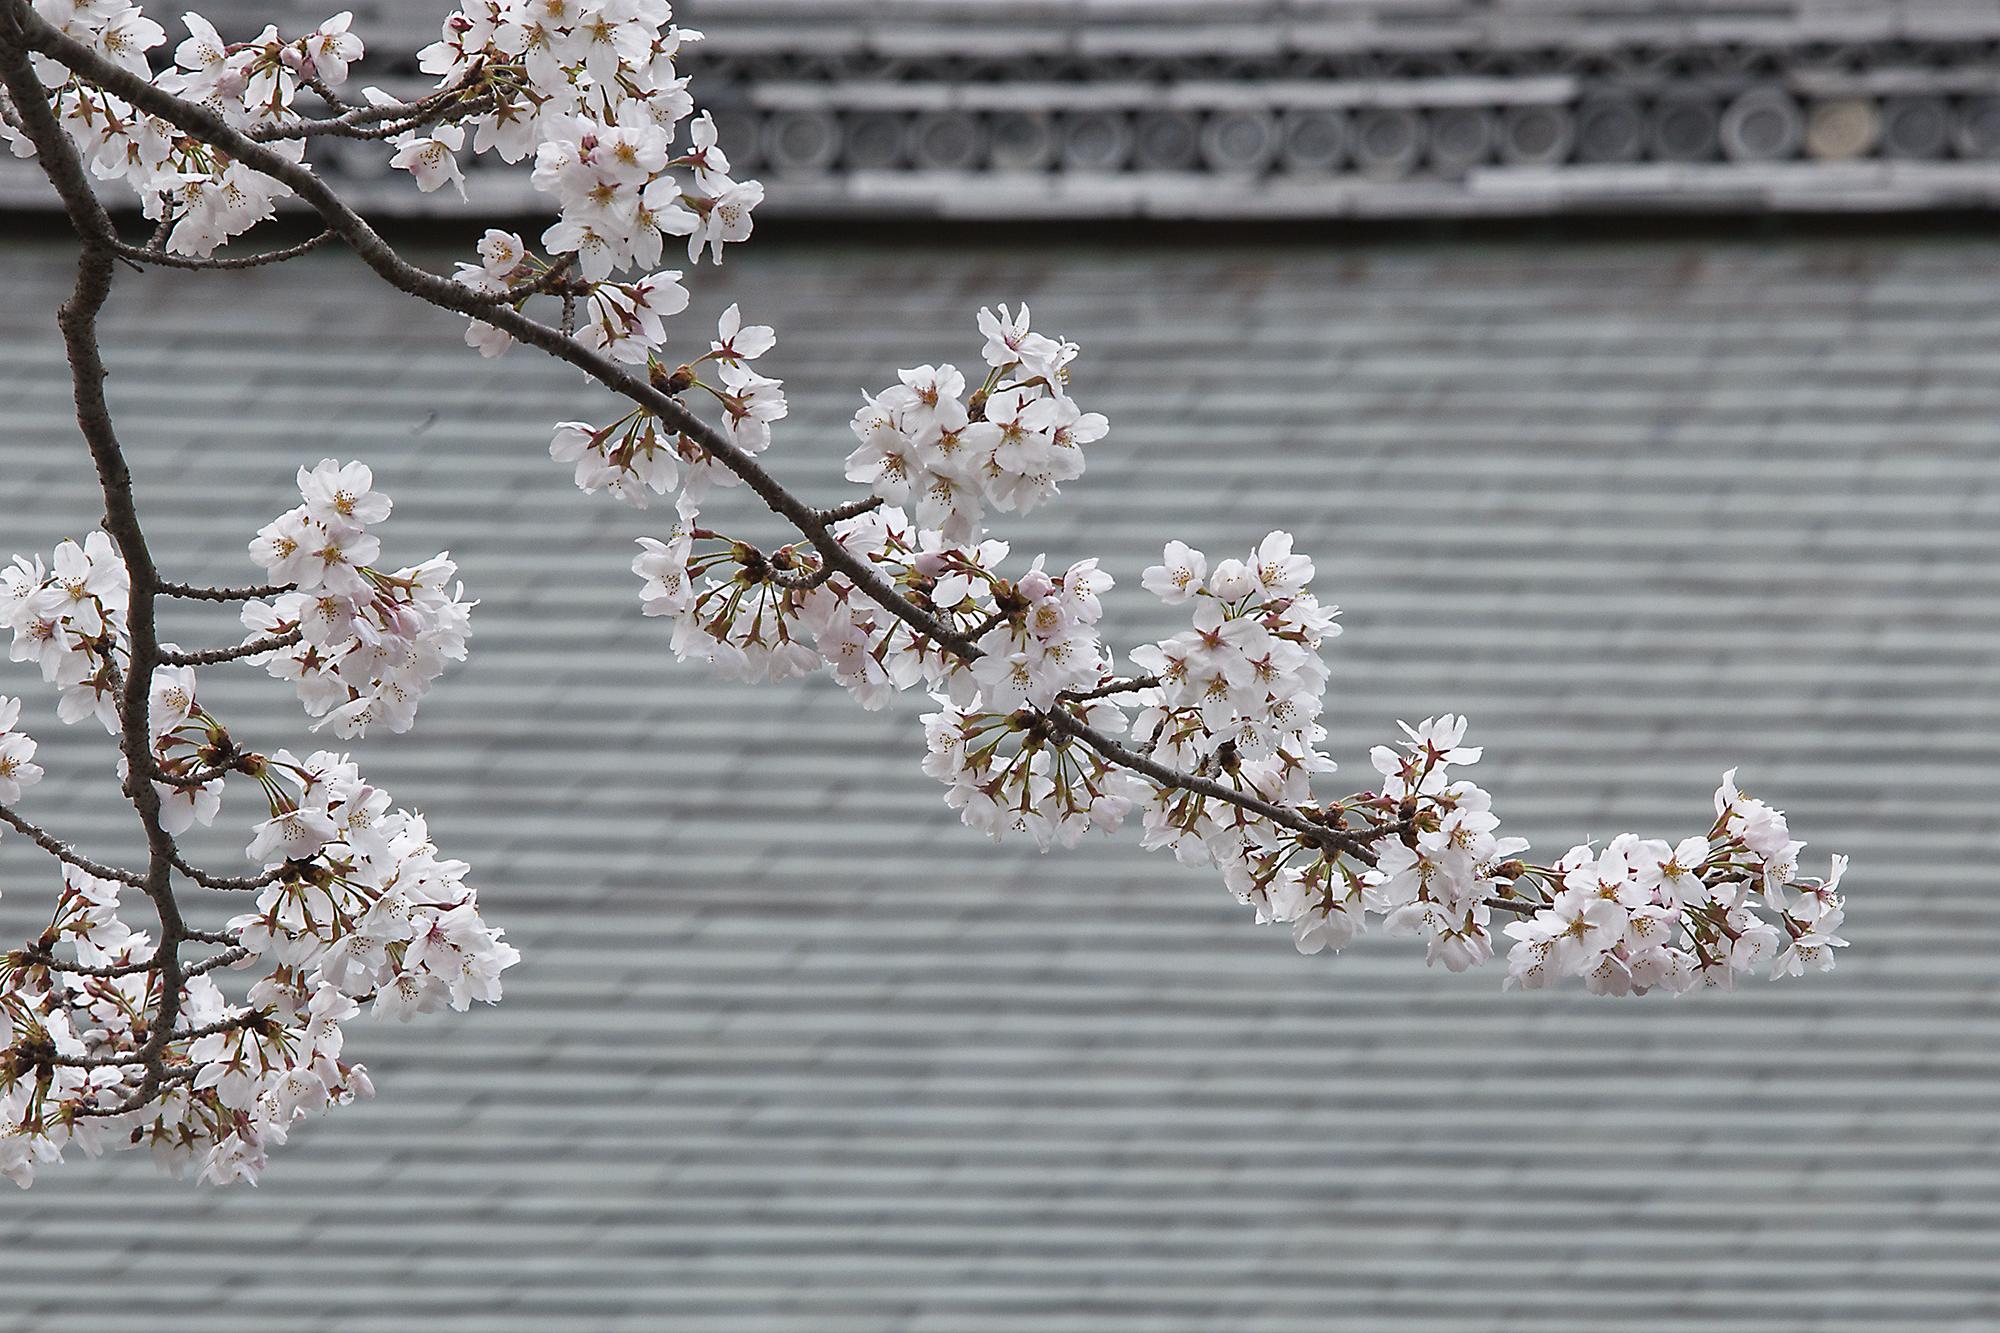 Hiroshima-Kurashiki-Kyoto-March 2014-4_39842.jpg